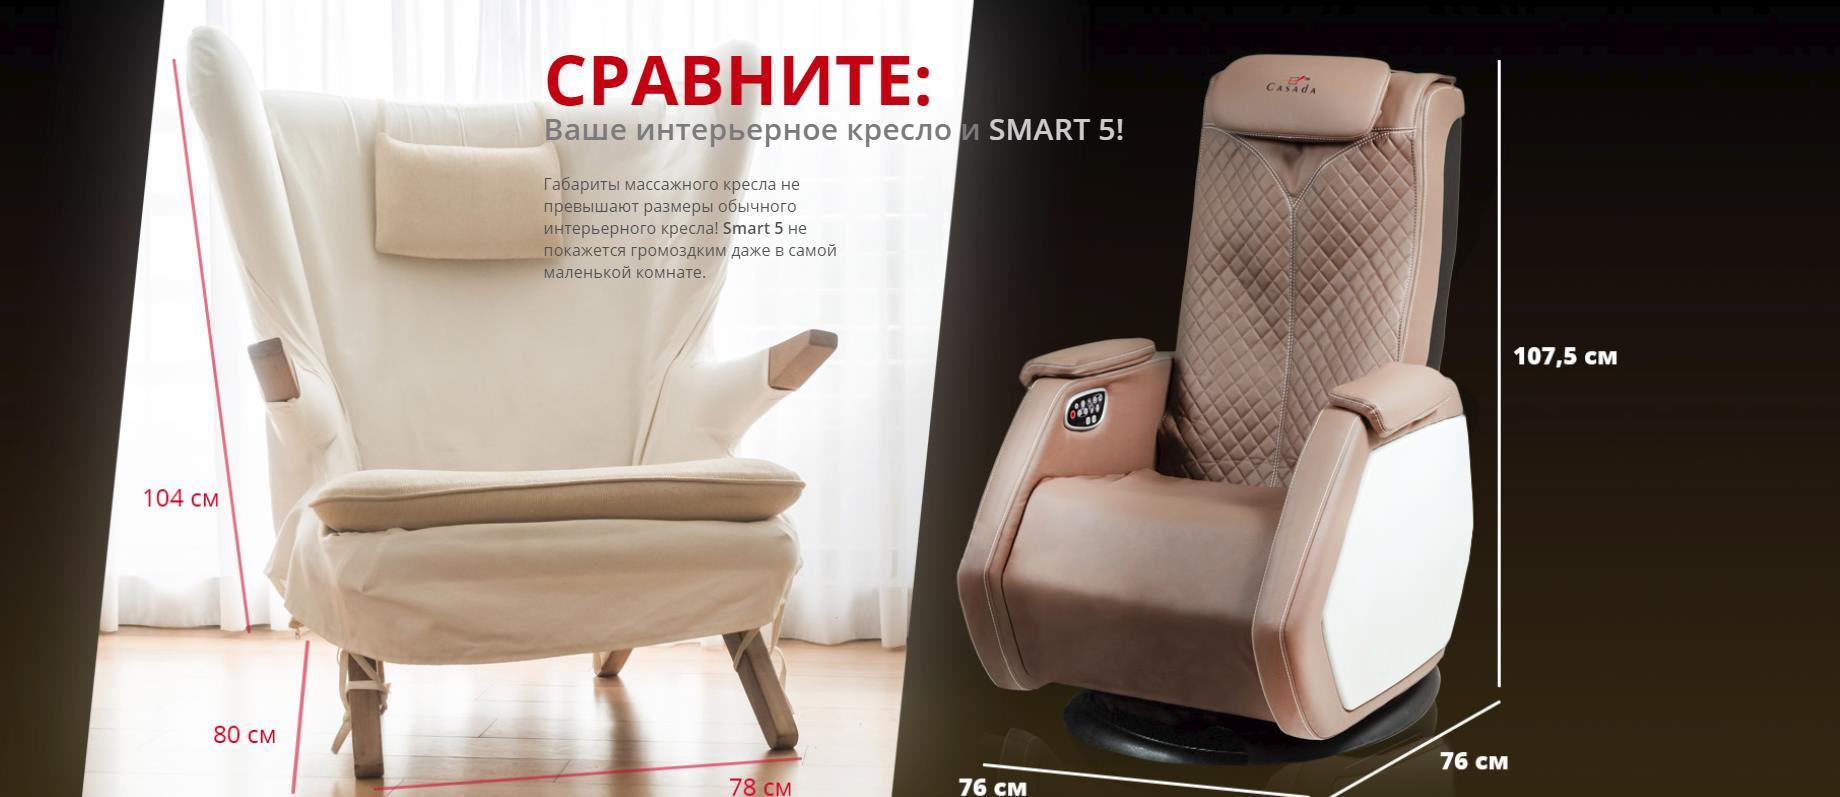 http://celebniymir.ru/images/upload/5088ddd989d6e0dae217495892bd5388.jpg